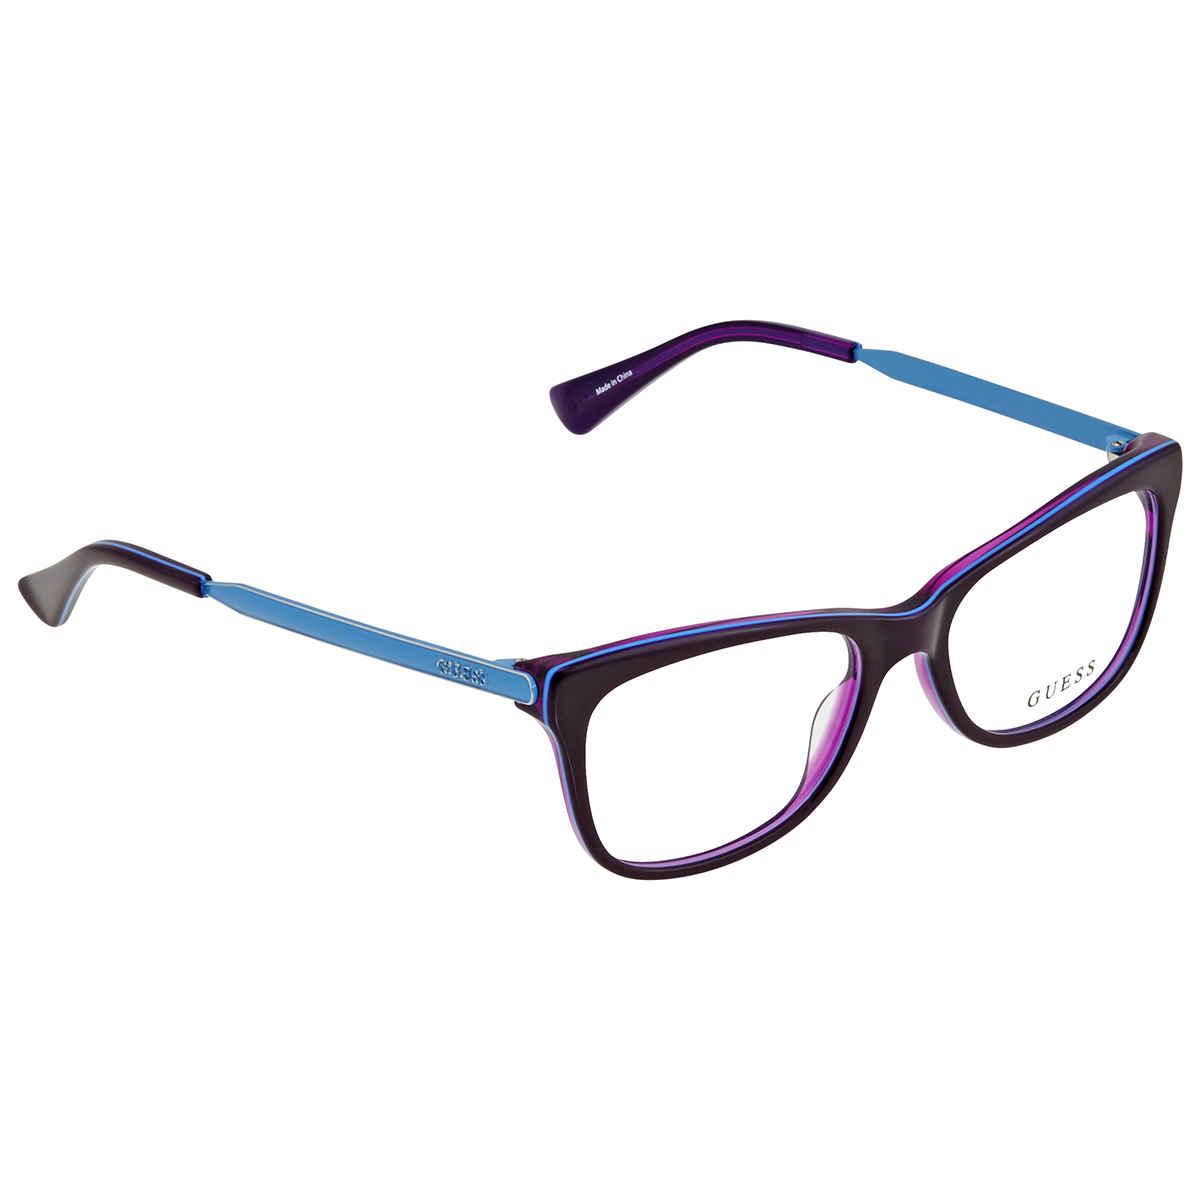 Guess Unisex Purple Round Eyeglass Frames Gu248708151